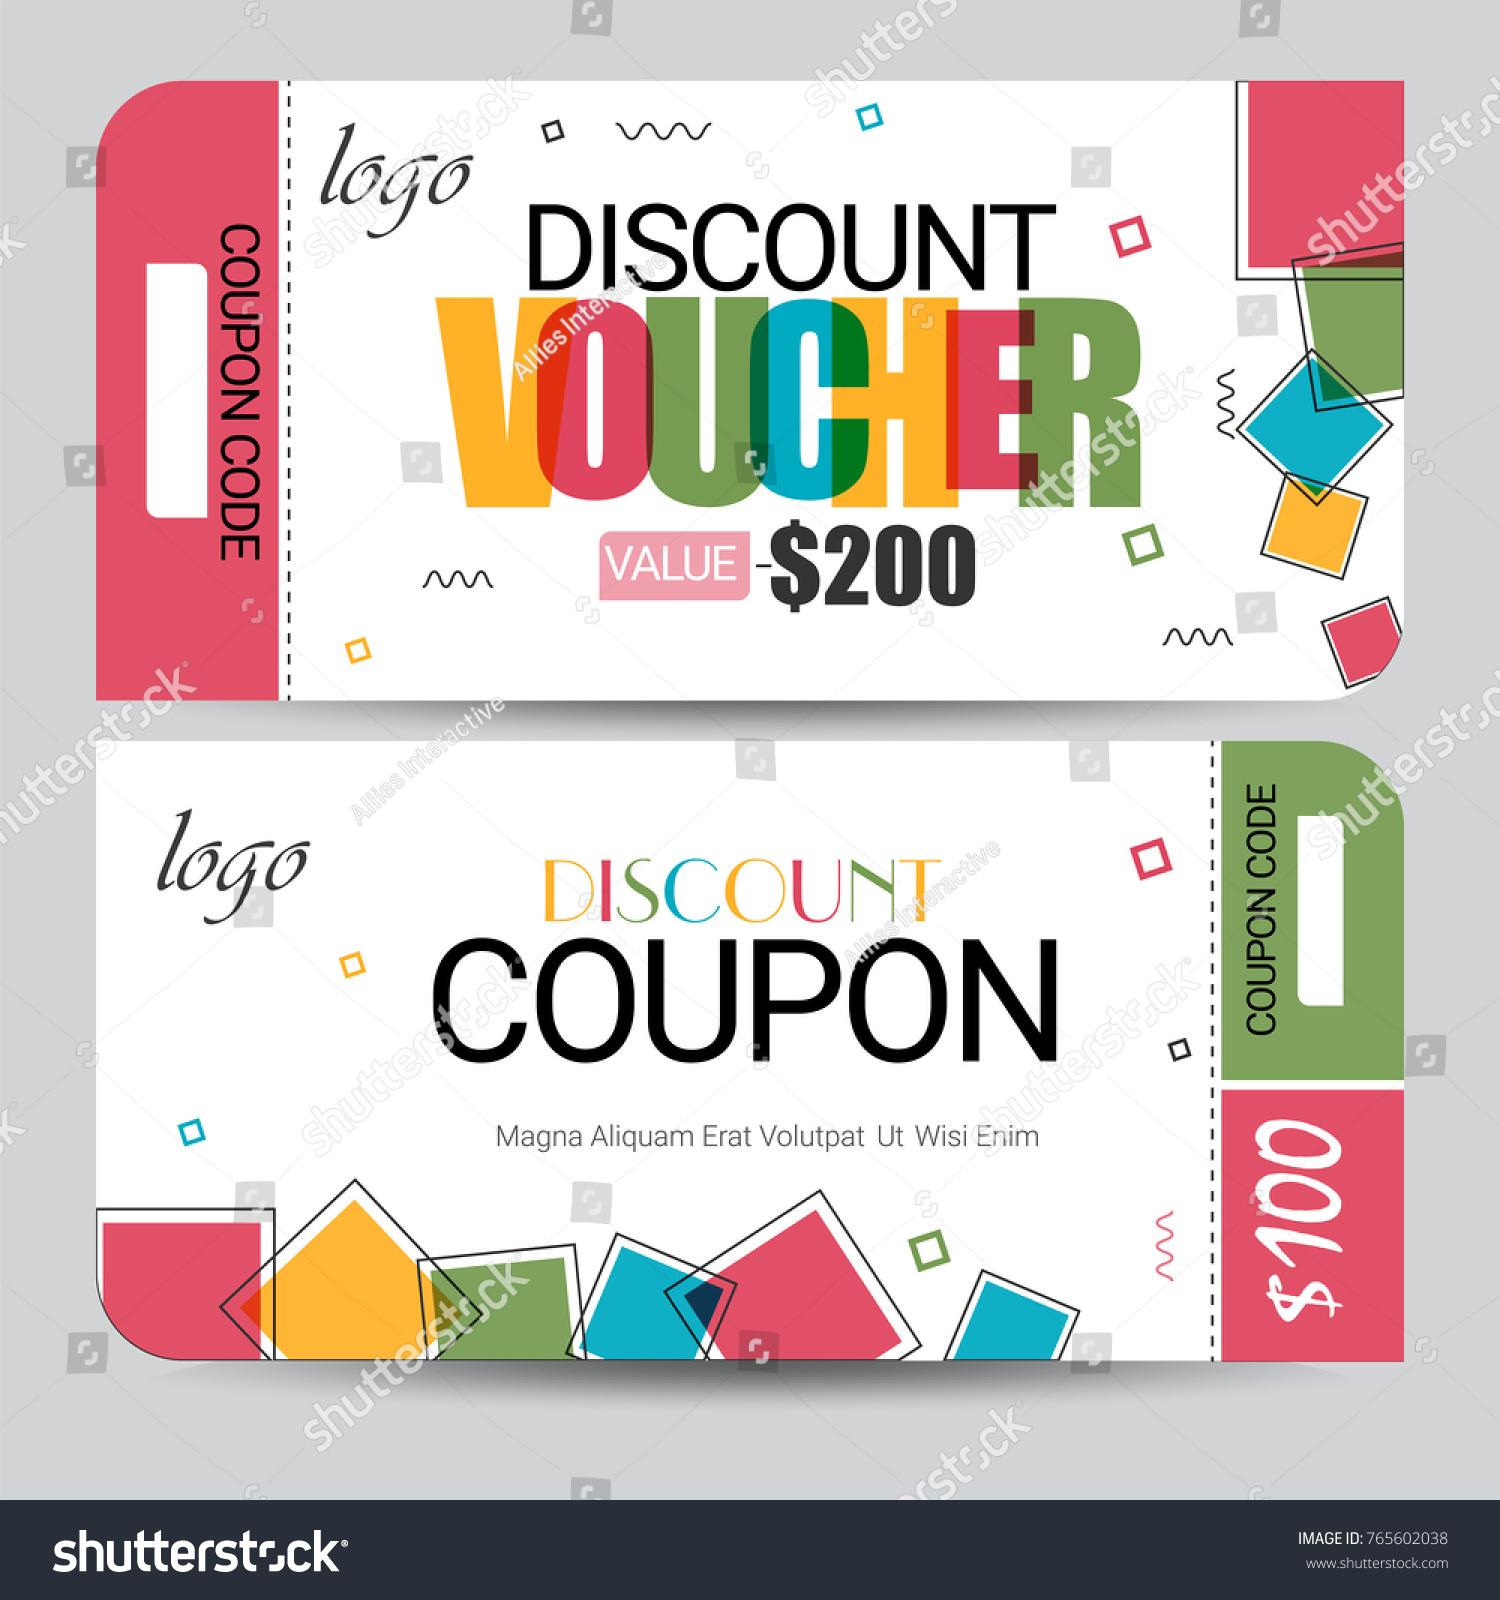 Creative discount voucher gift card coupon stock vector 765602038 creative discount voucher gift card coupon stock vector 765602038 shutterstock negle Gallery